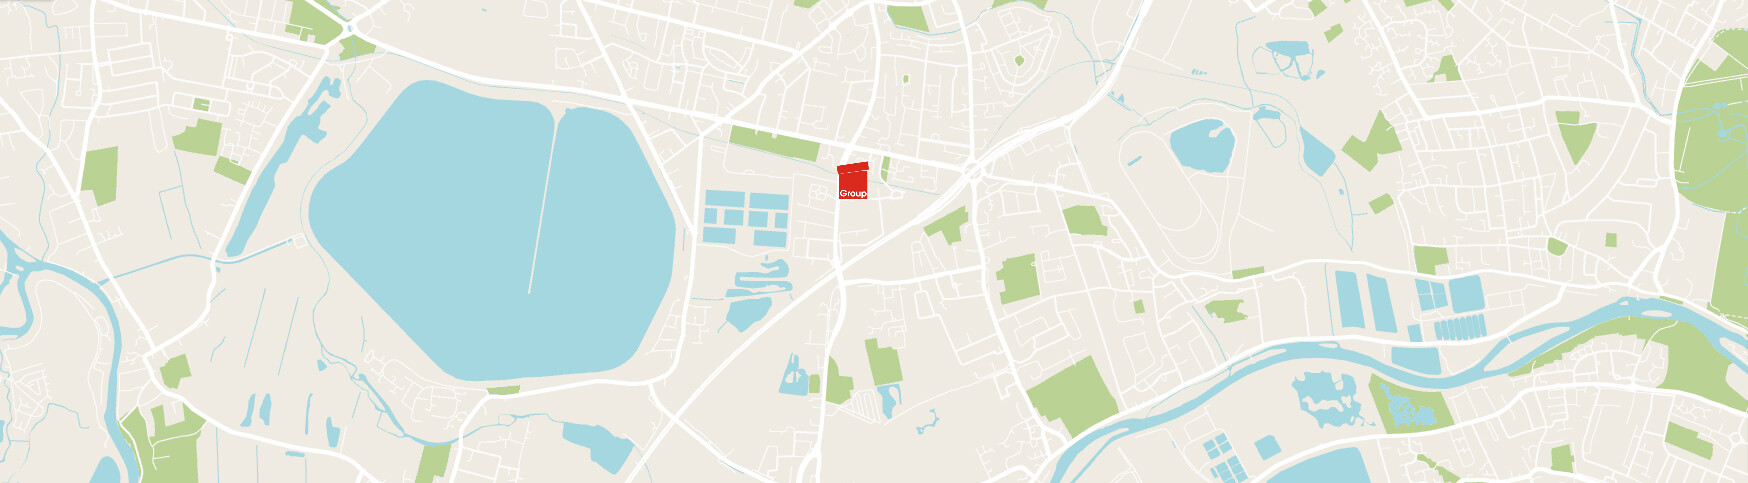 redboxmap